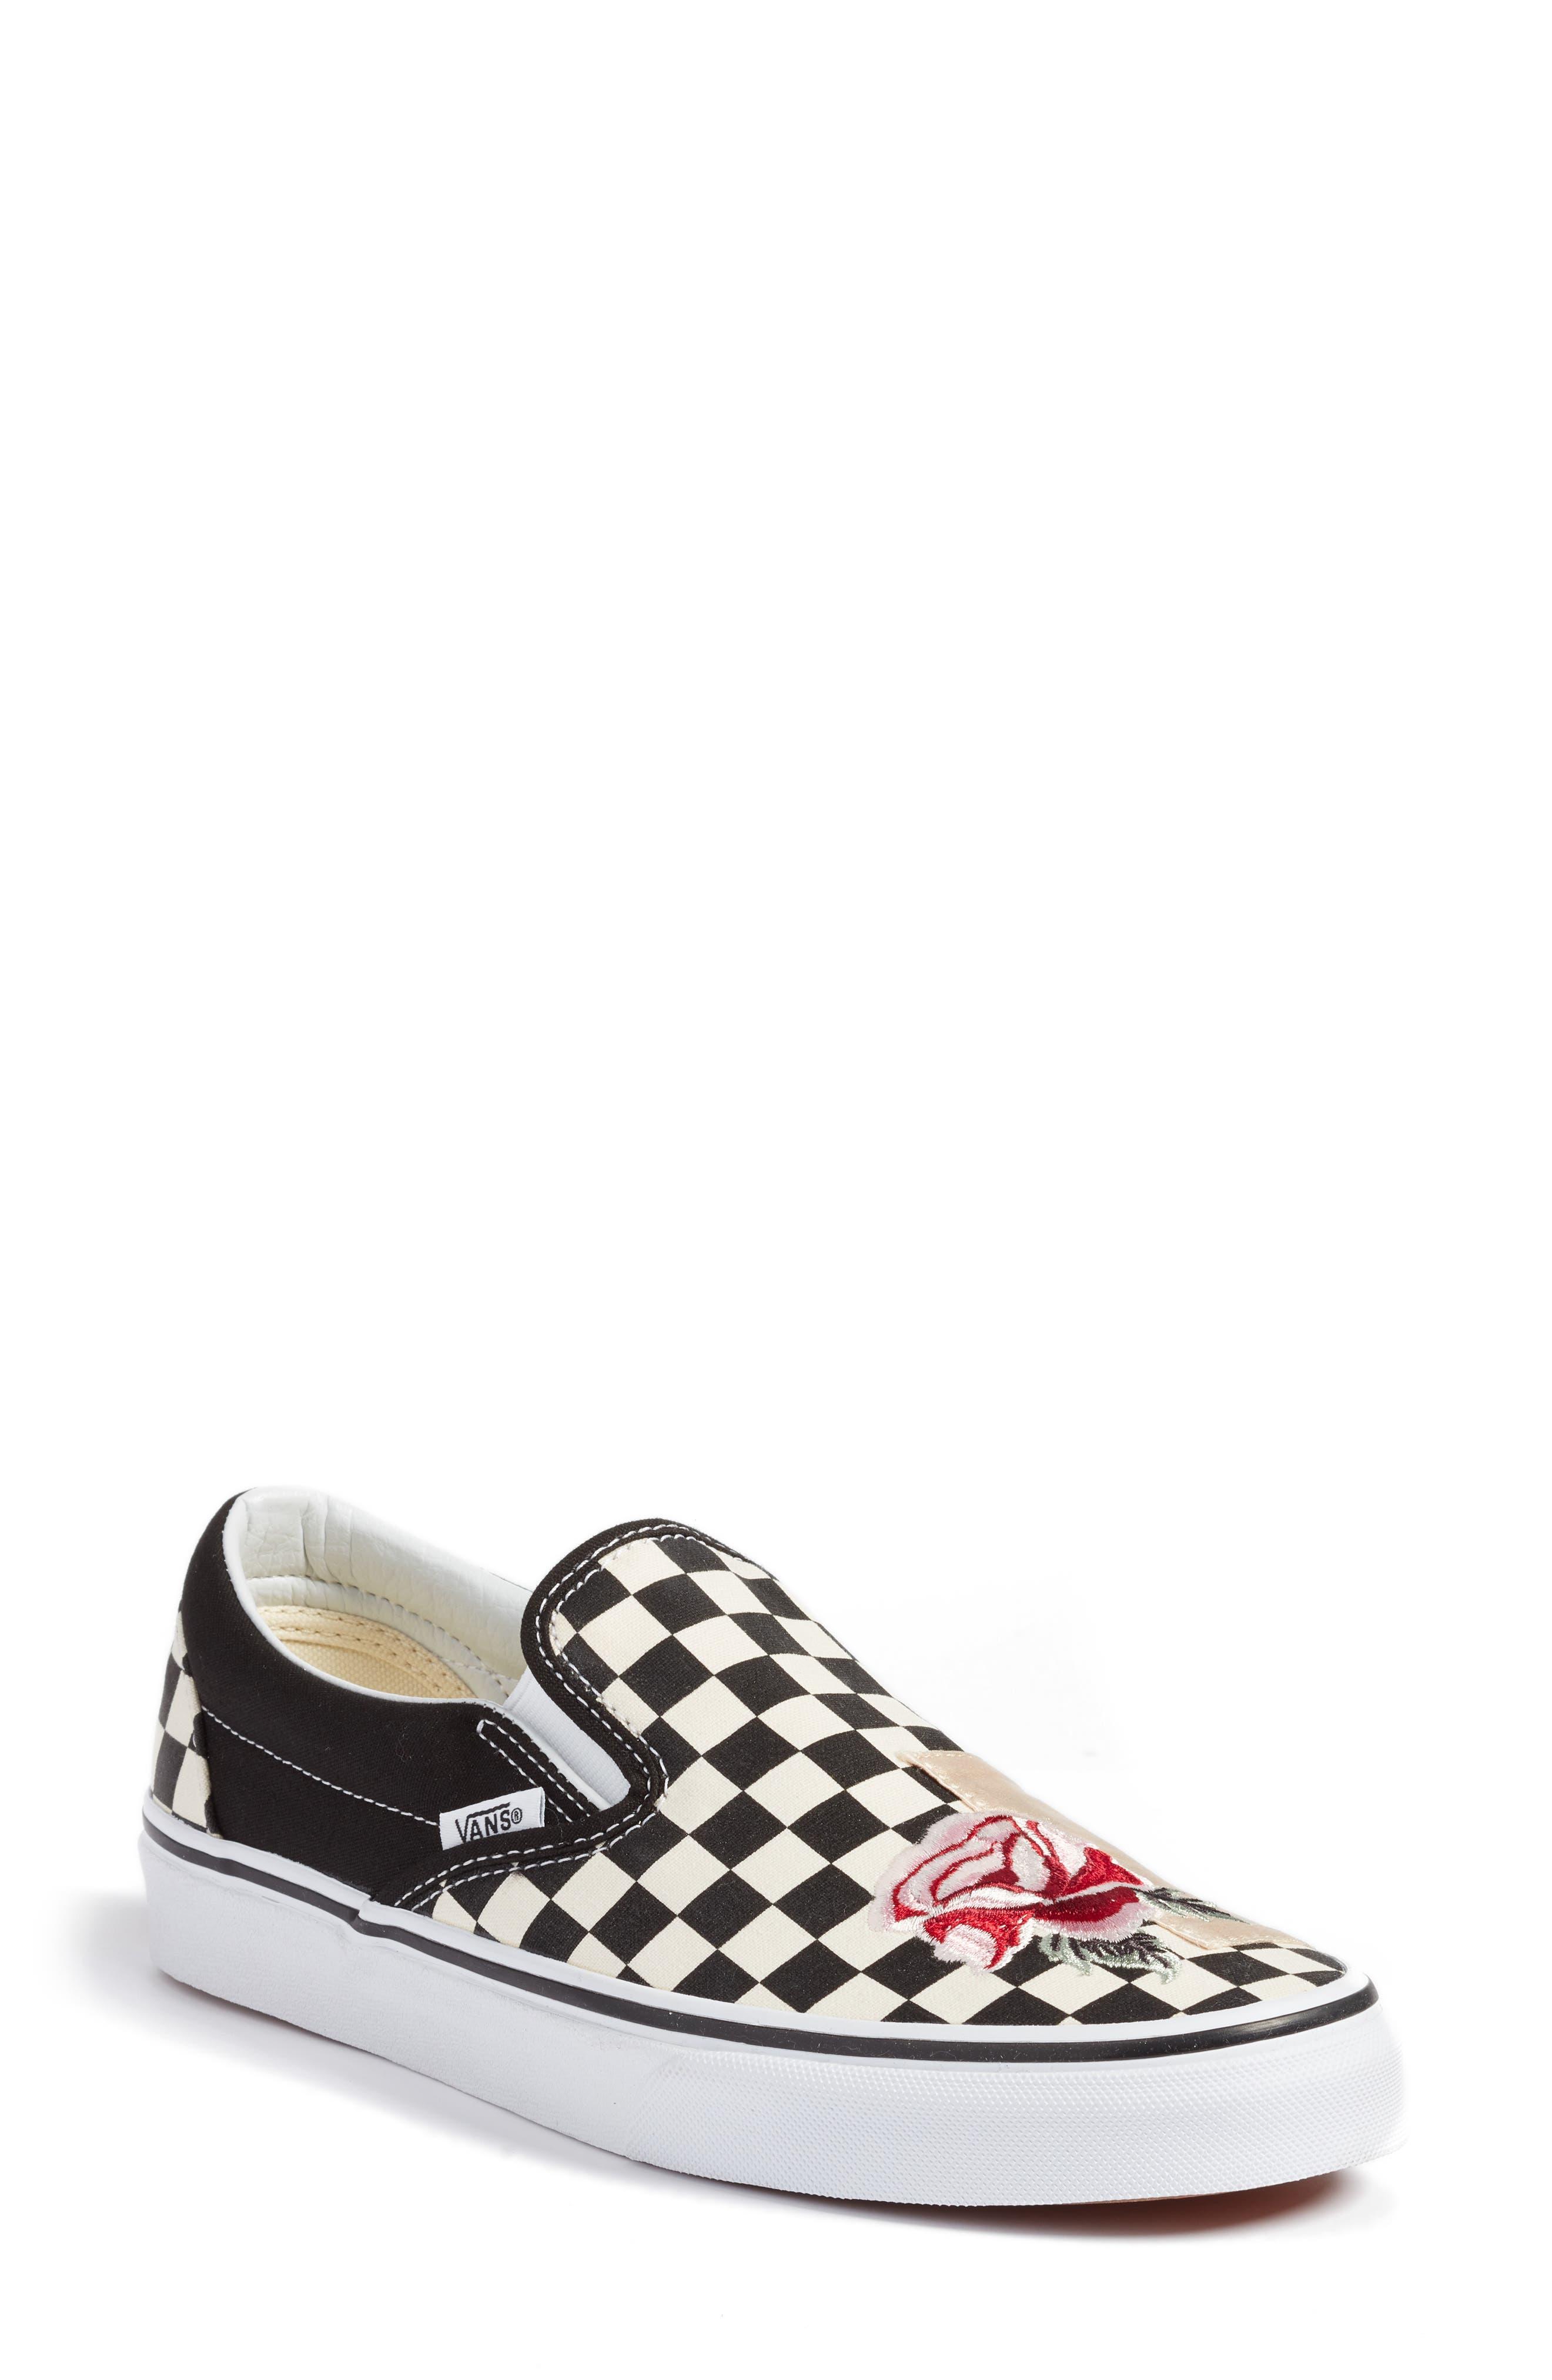 UA Classic Slip-On Sneaker,                             Main thumbnail 1, color,                             CHECKER/ ROSE